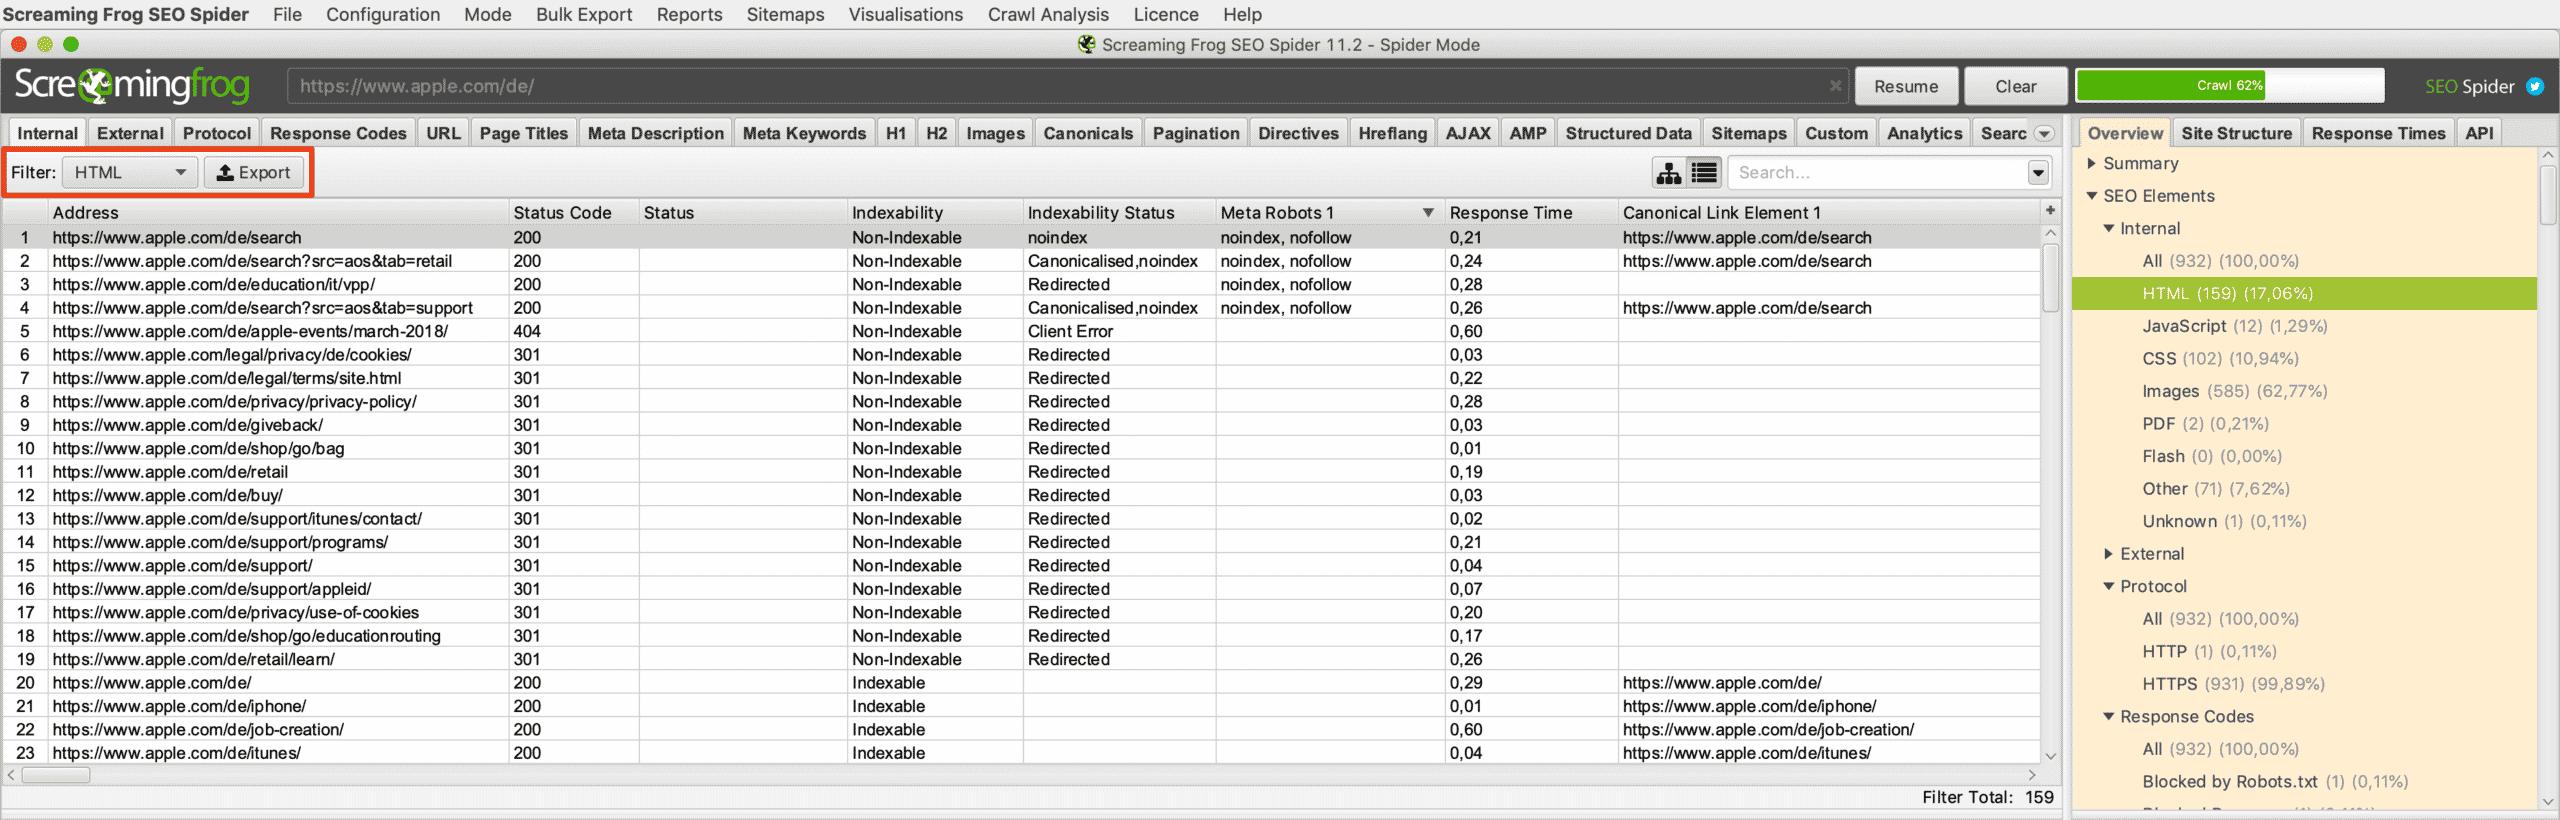 Export-Funktion der Daten-Tabelle vom gewünschten Overview-Filter